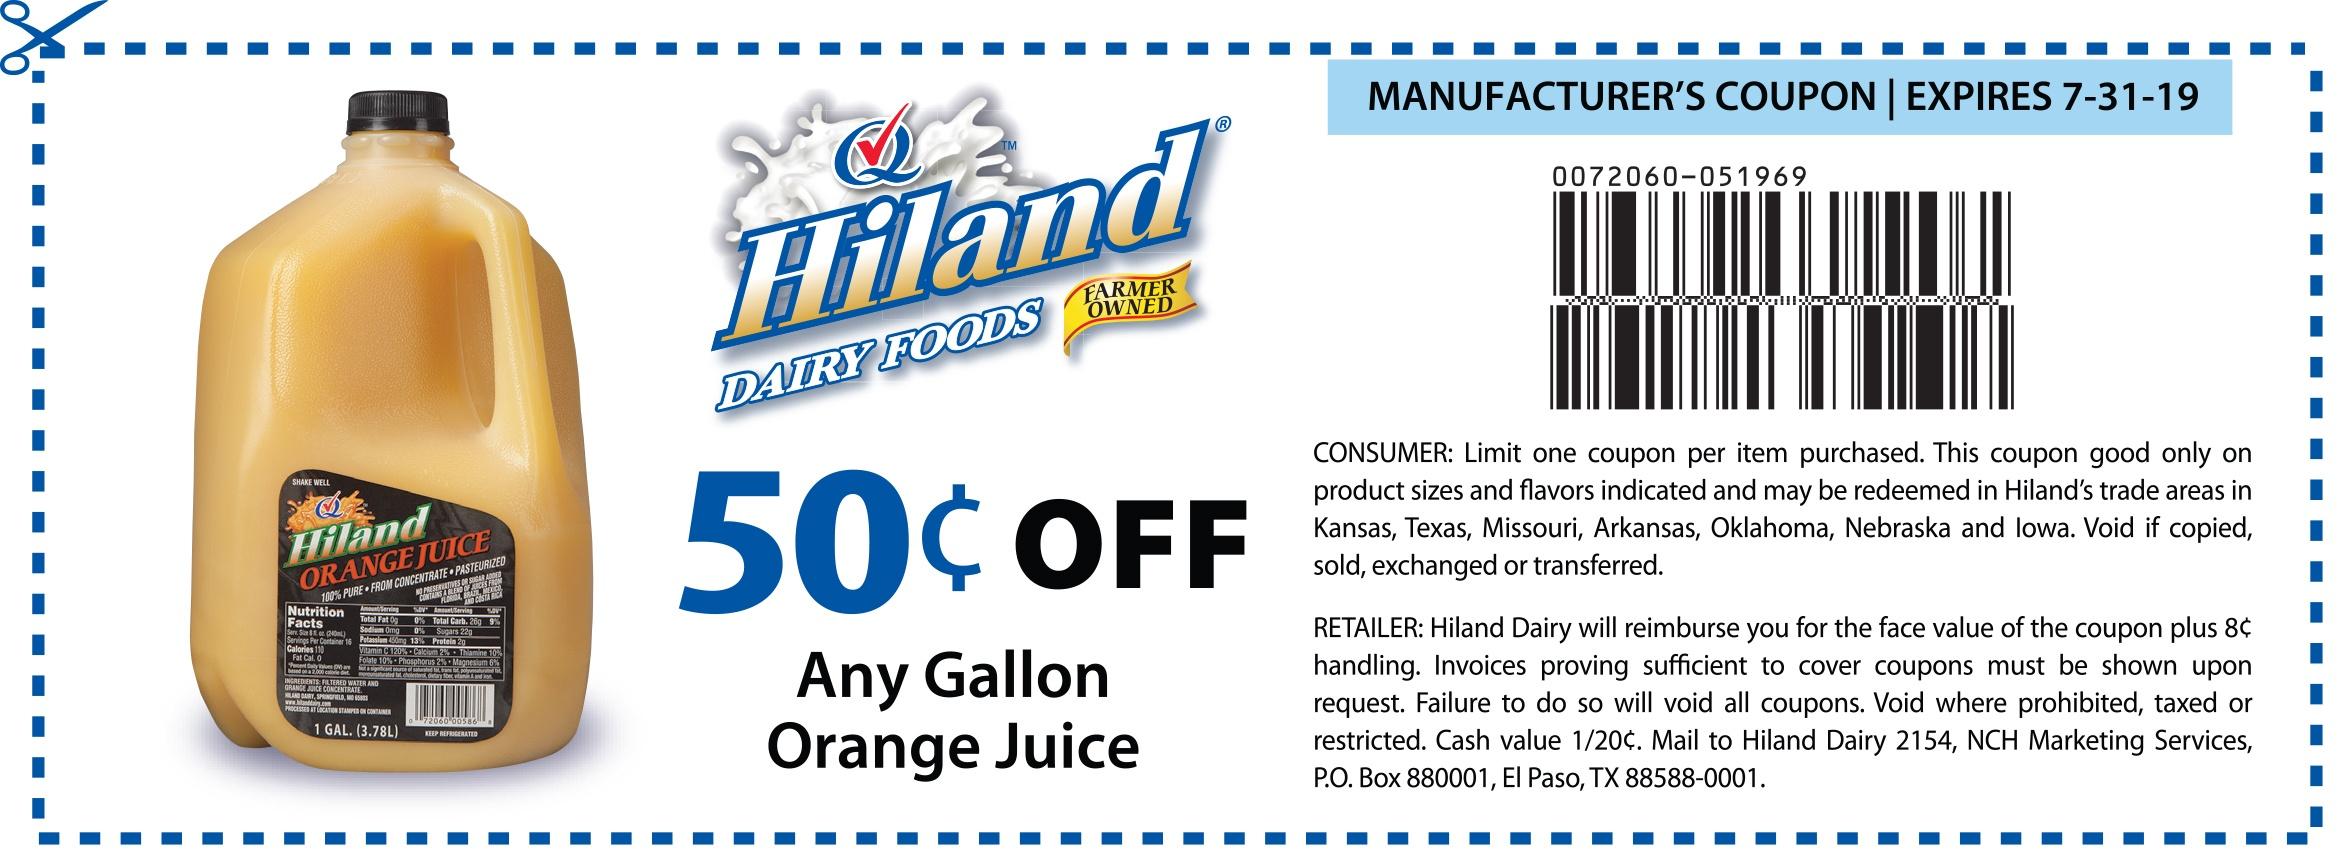 Hiland Dairy | Coupons Print - Free Milk Coupons Printable